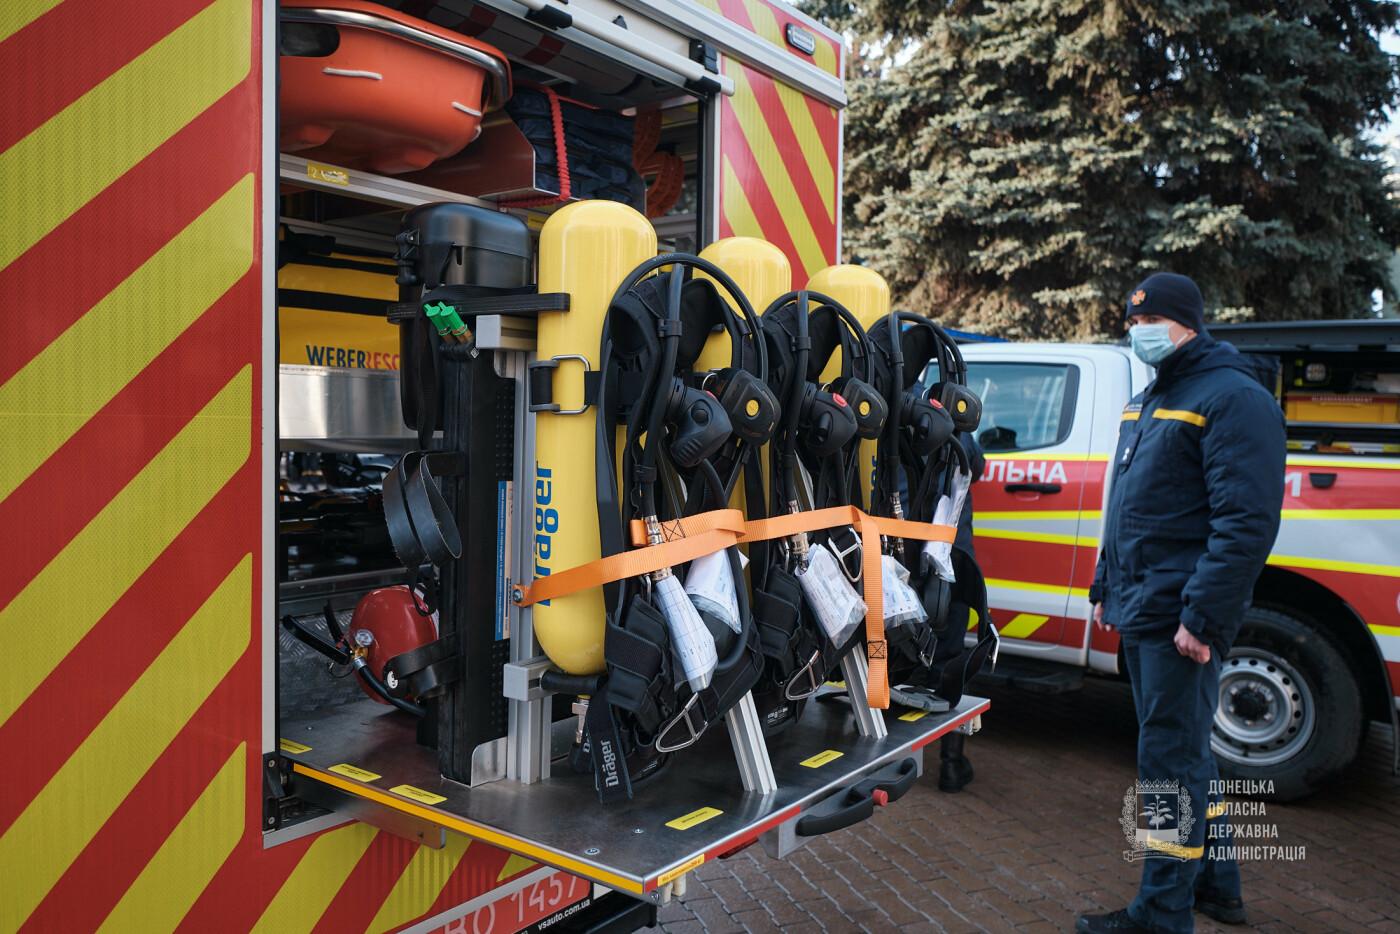 Слов'янські рятувальники отримали нову пожежну автоцистерну, фото-12